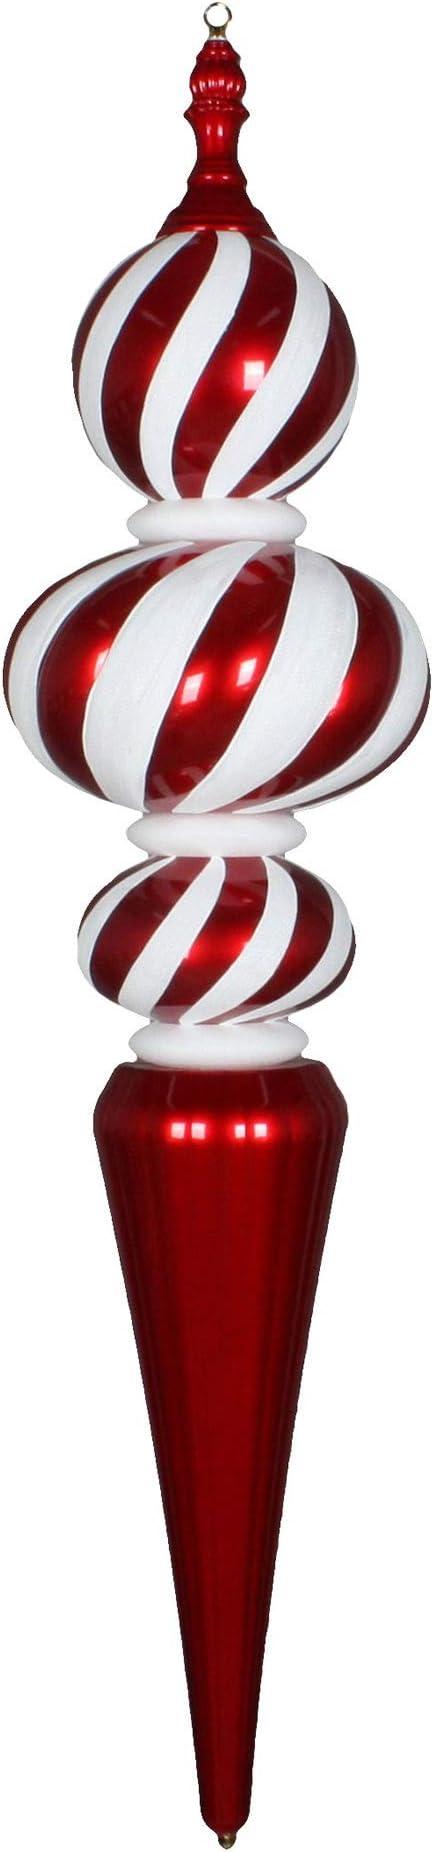 Vickerman Finial Ornament 51 Red White Home Kitchen